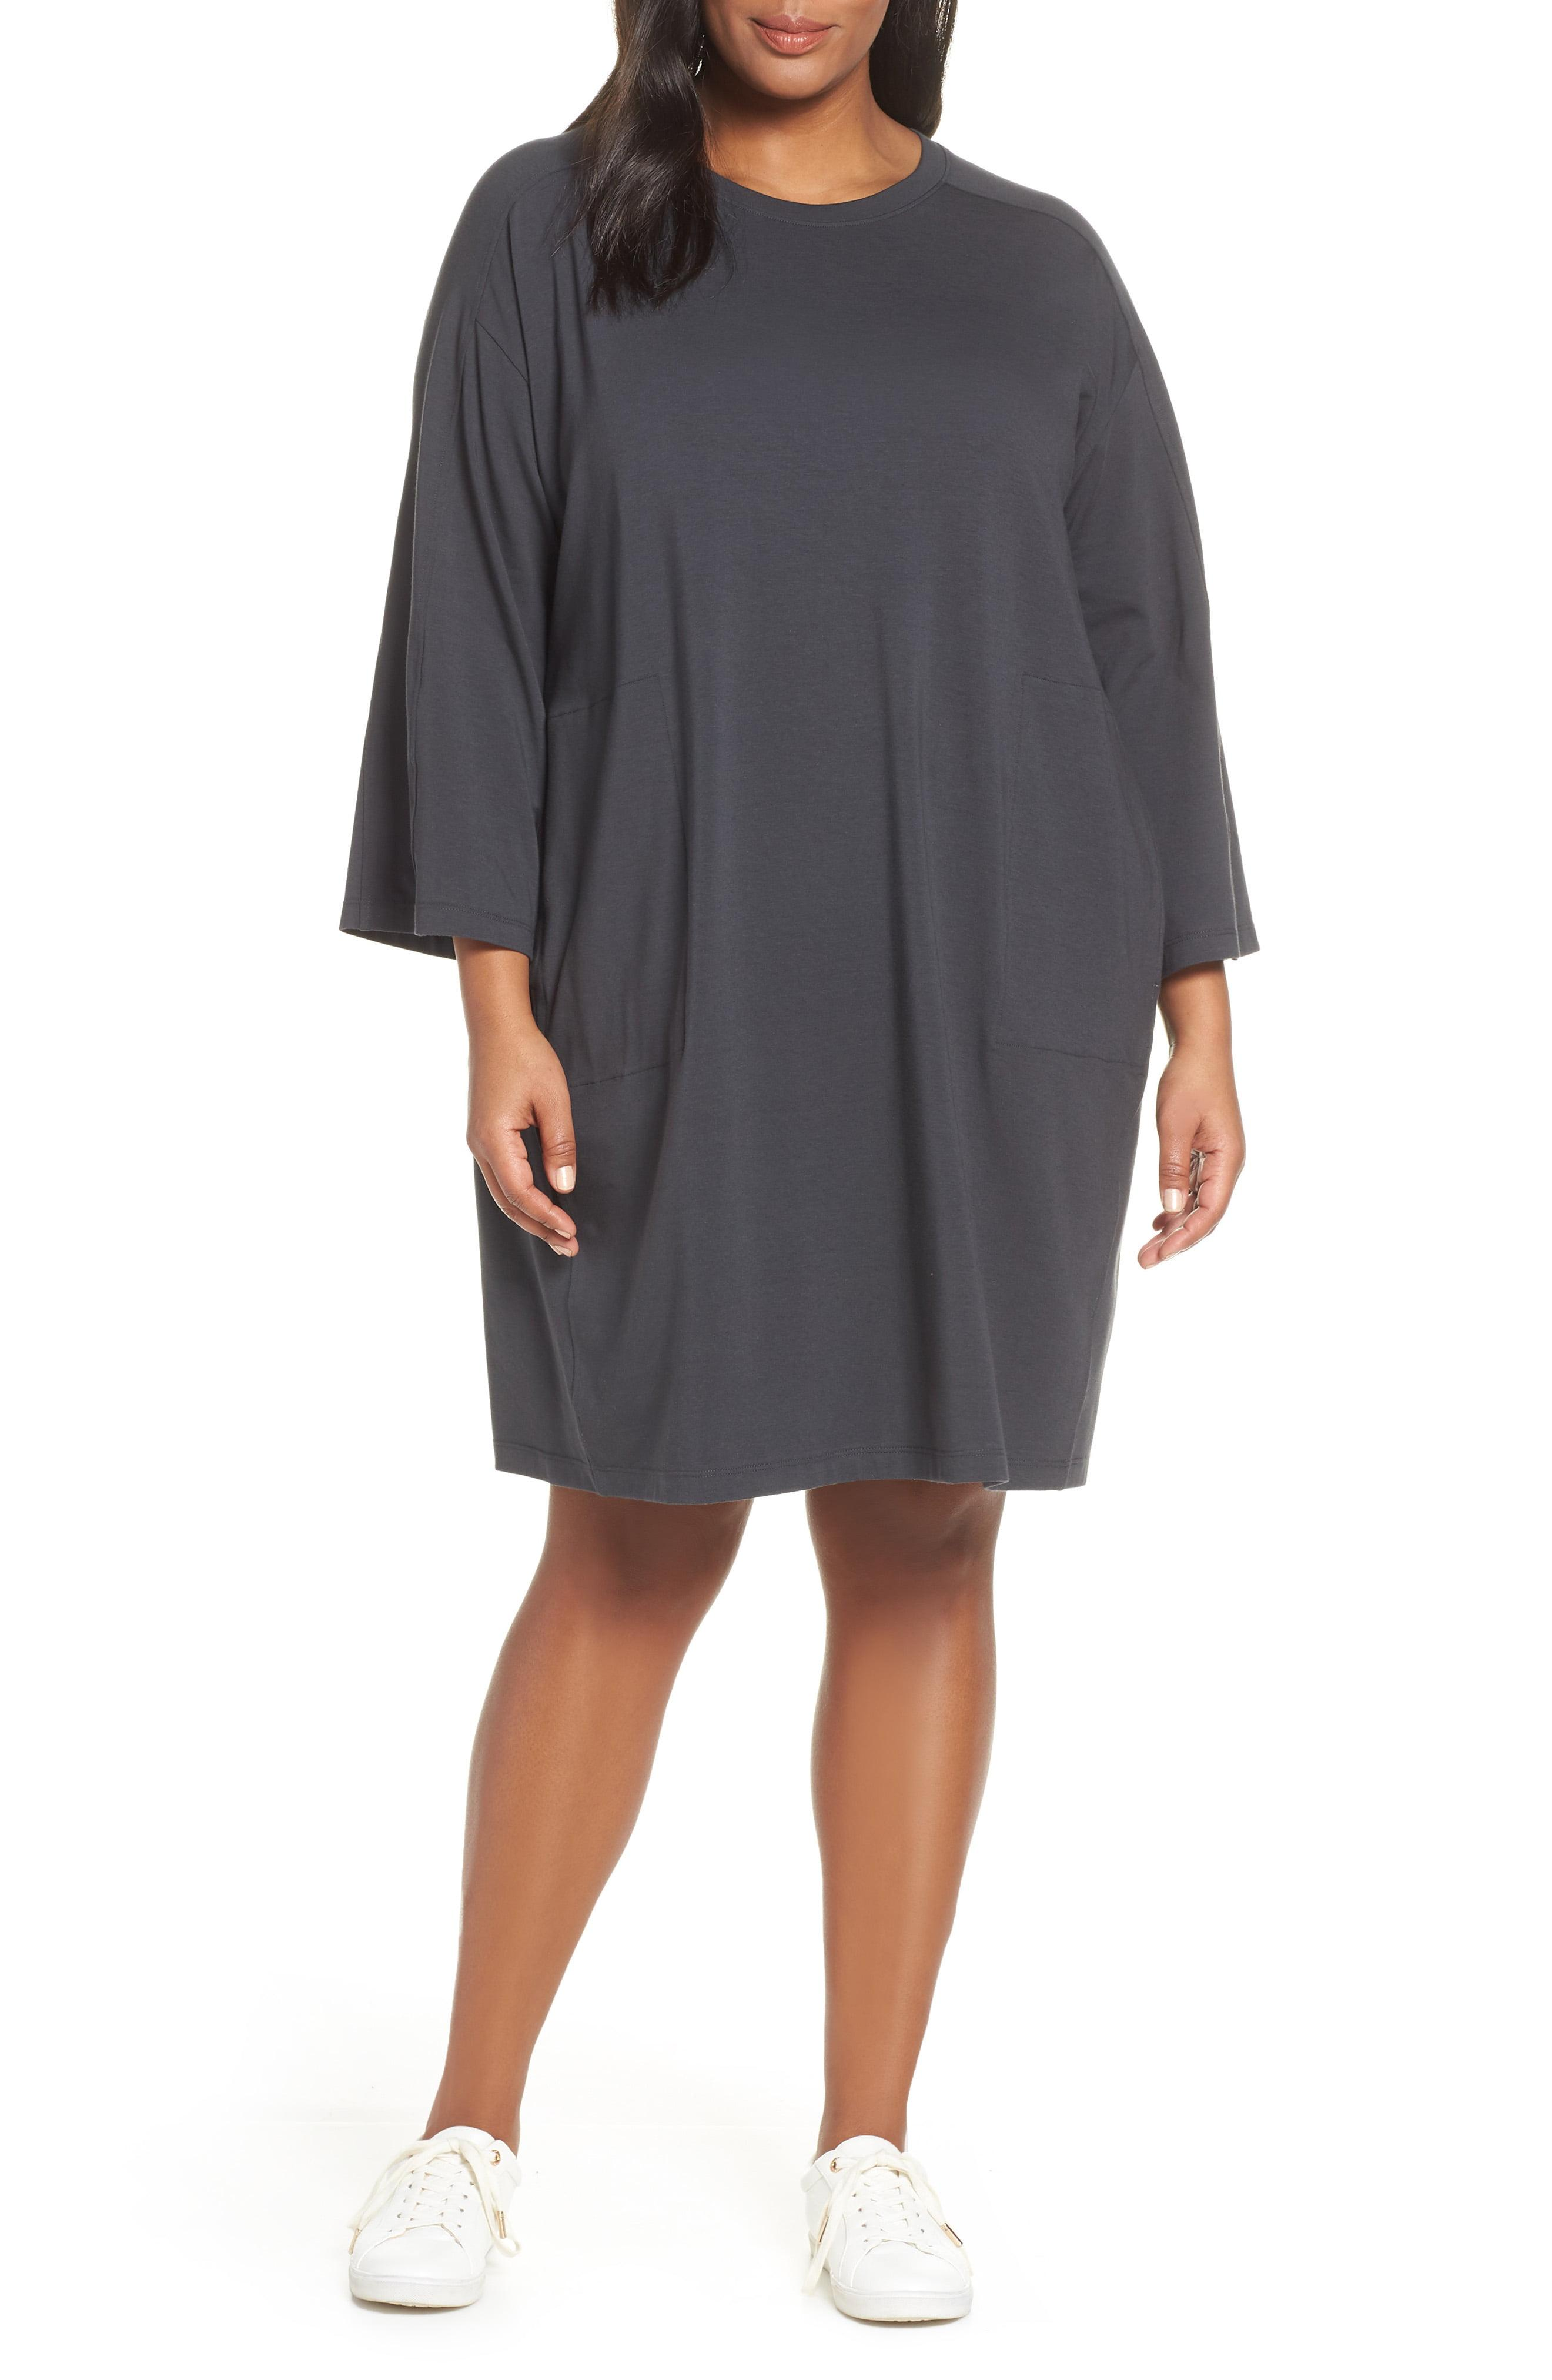 77148ac069 Lyst - Eileen Fisher Crewneck T-shirt Dress in Gray